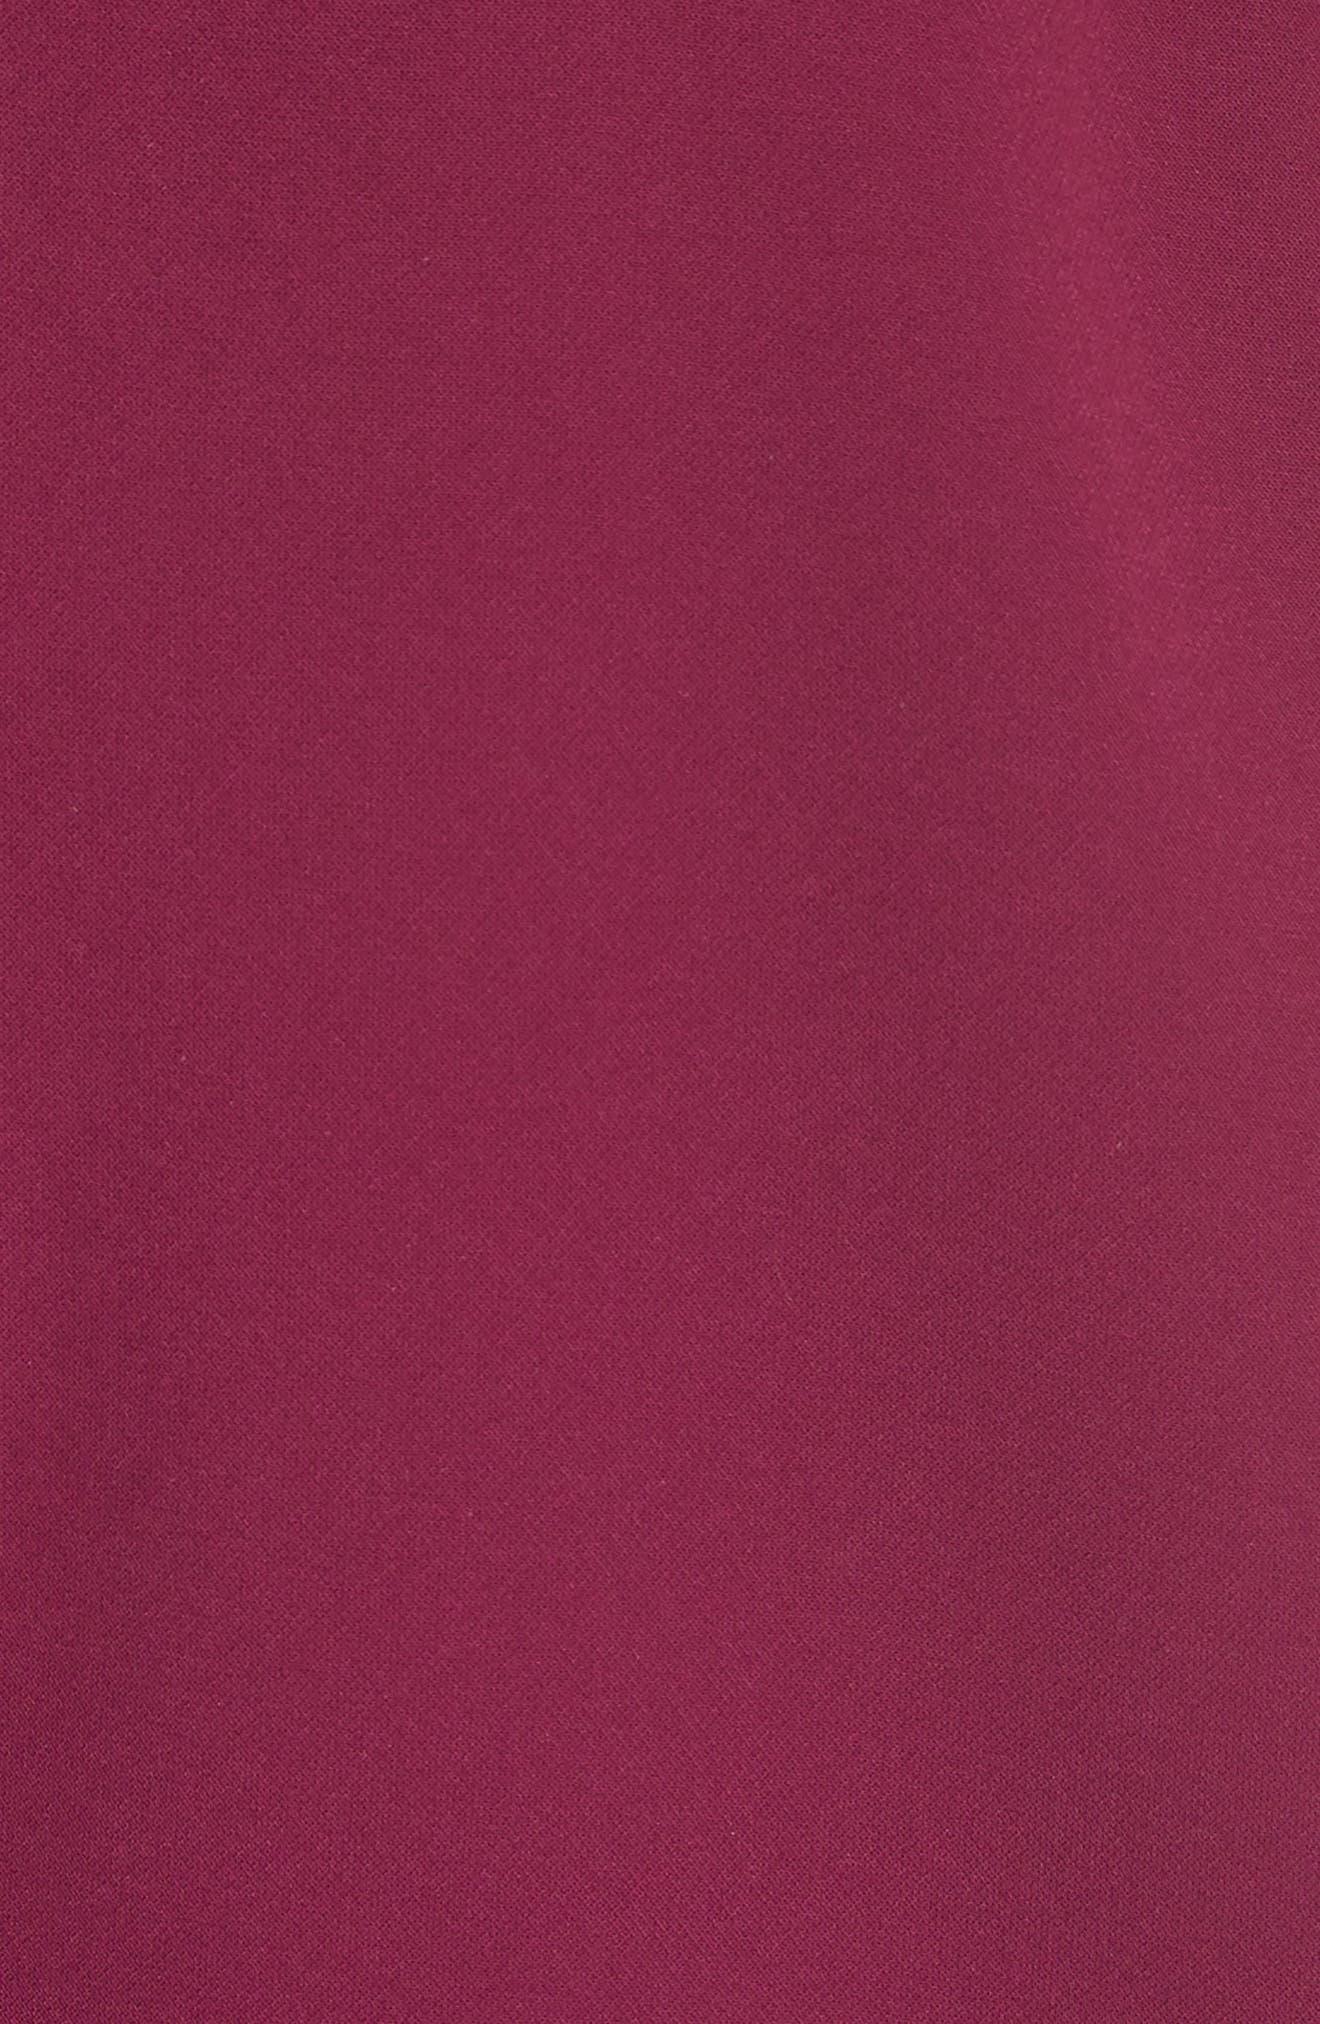 Scalloped A-Line Dress,                             Alternate thumbnail 5, color,                             Dusky Pink